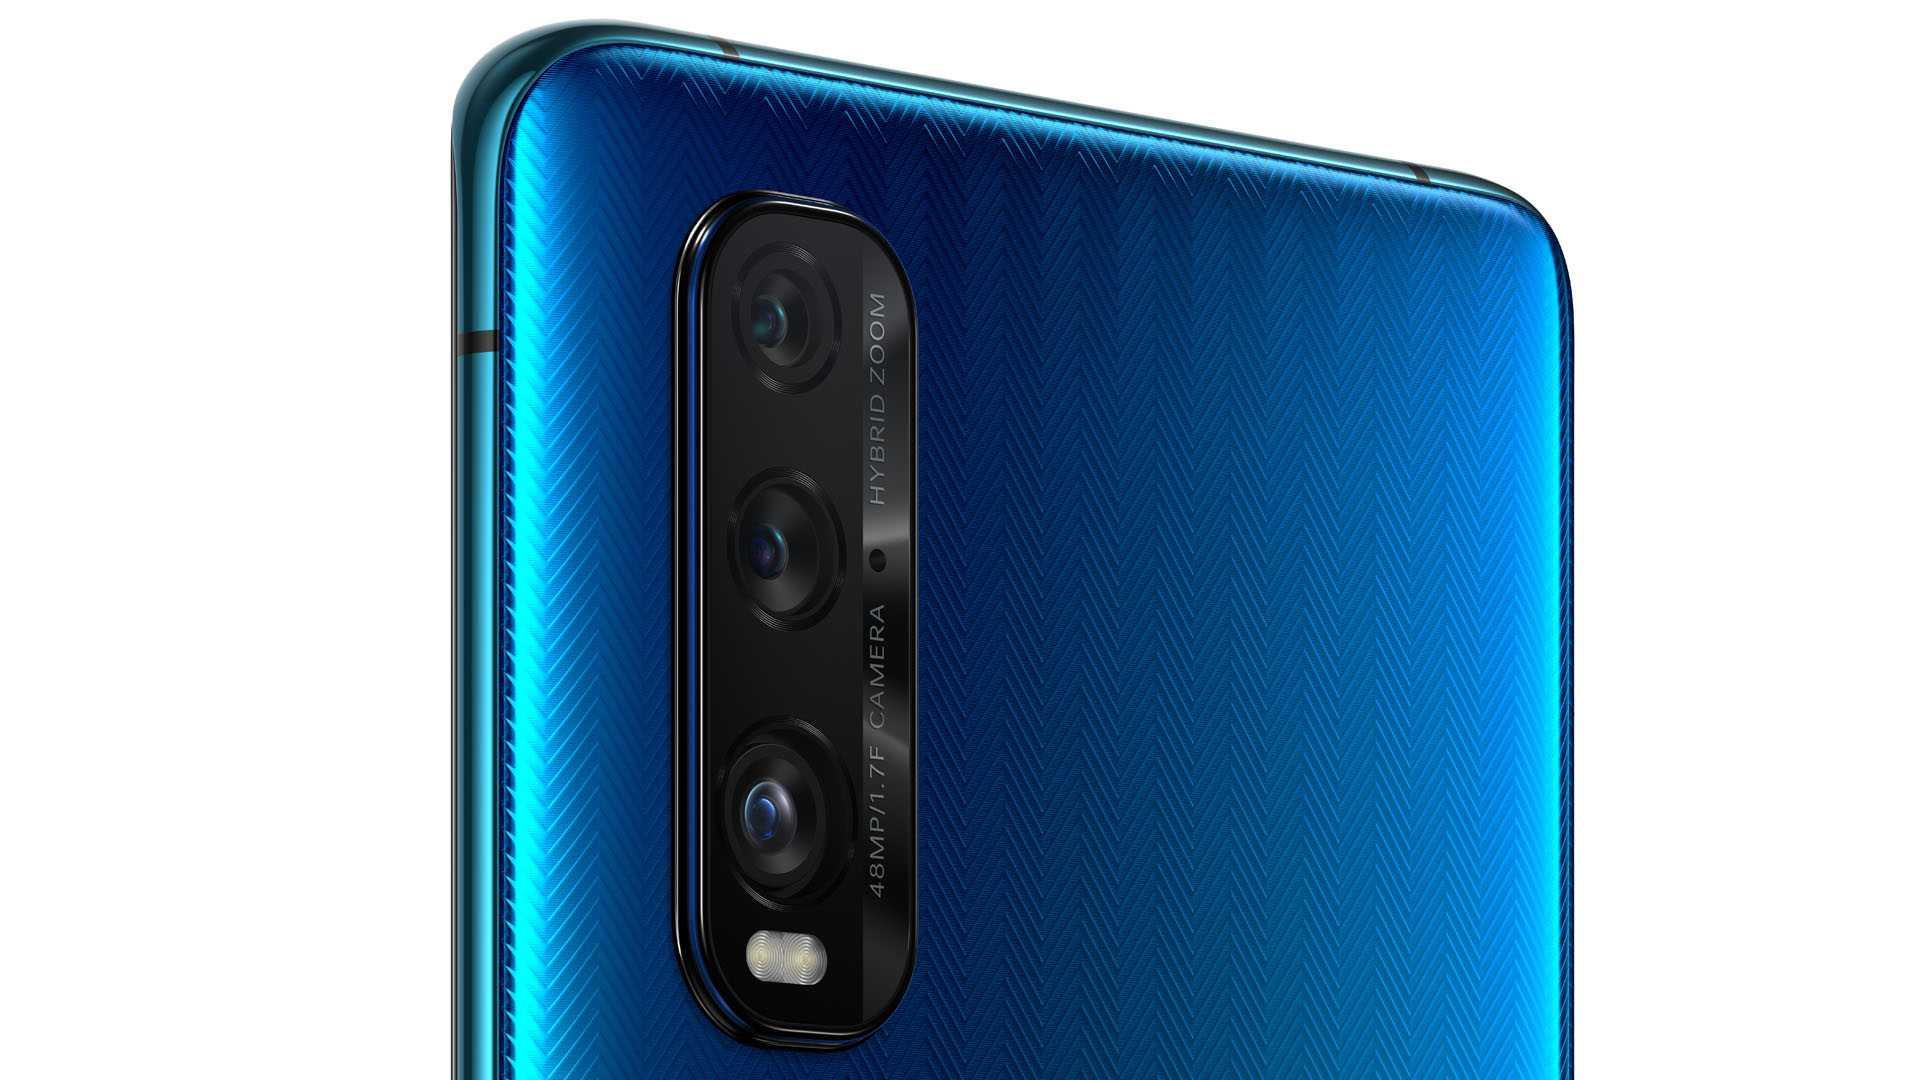 Серьезно? oppo find x2 и find x2 pro — китайцы по цене galaxy s20 - androidinsider.ru